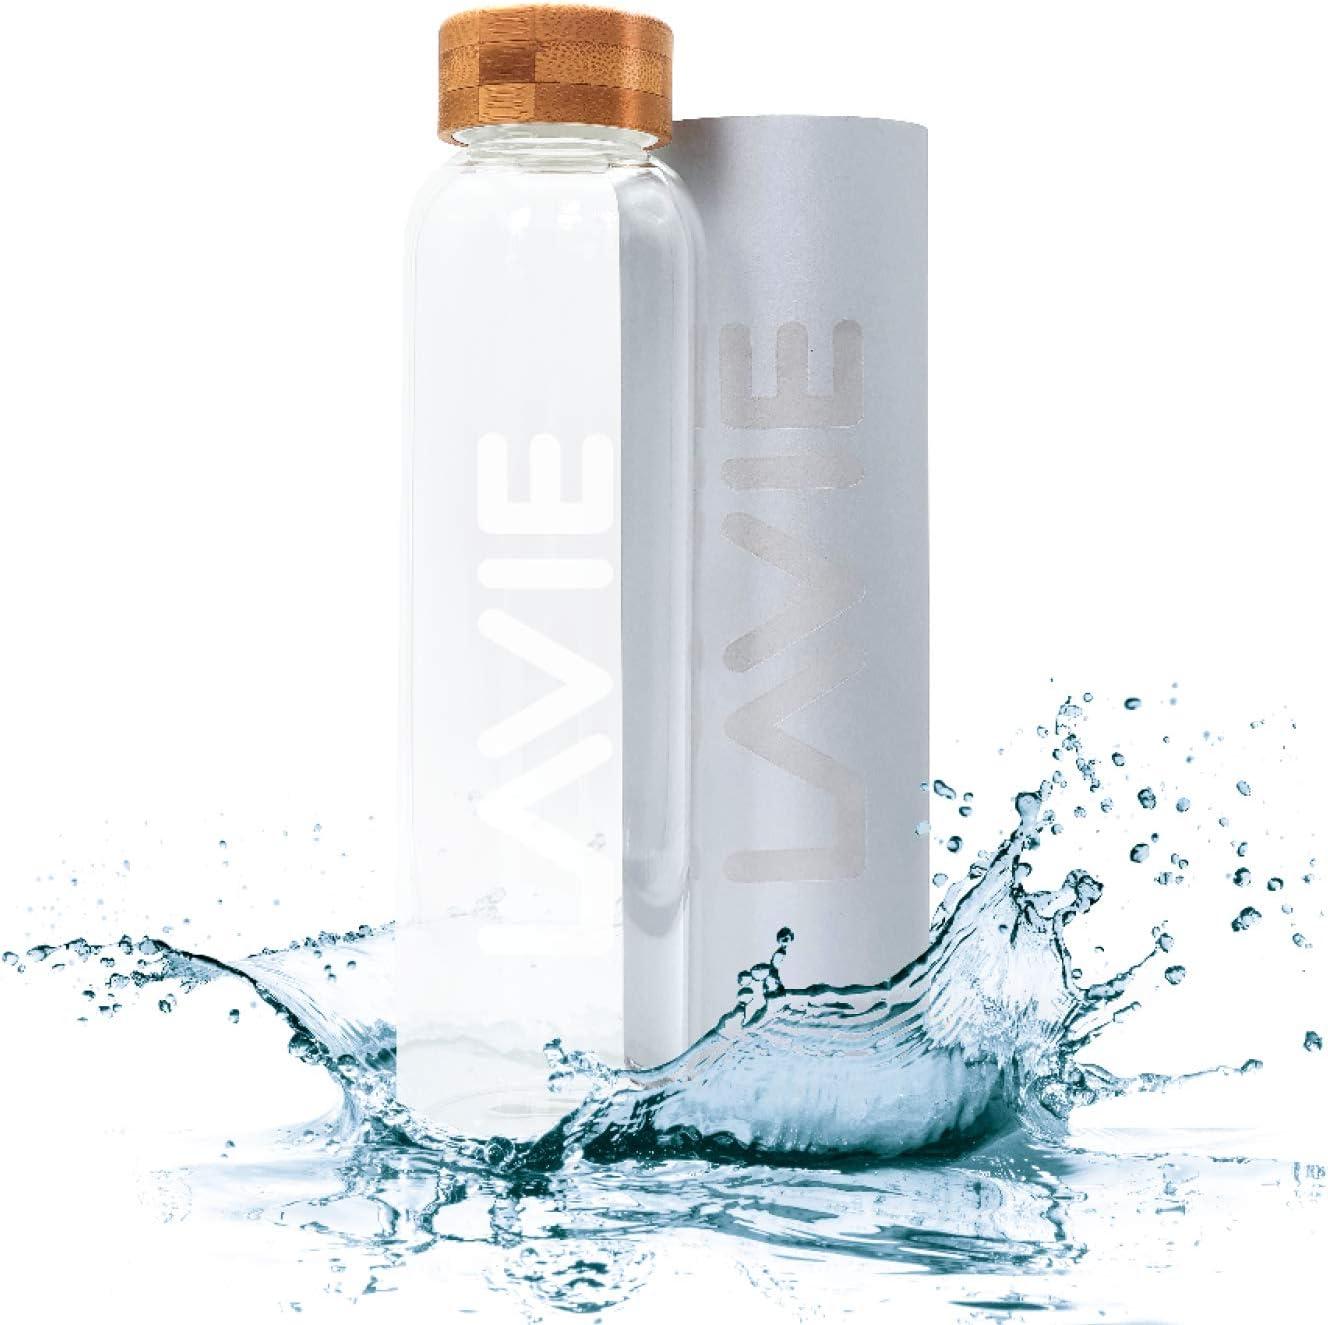 LaVie 2GO - Purificador de agua portátil de aluminio (0,5 L) con caja de aluminio, purifica el agua en 15 minutos con luz UVA, sin filtros, sin mantenimiento, solo agua dulce pura: